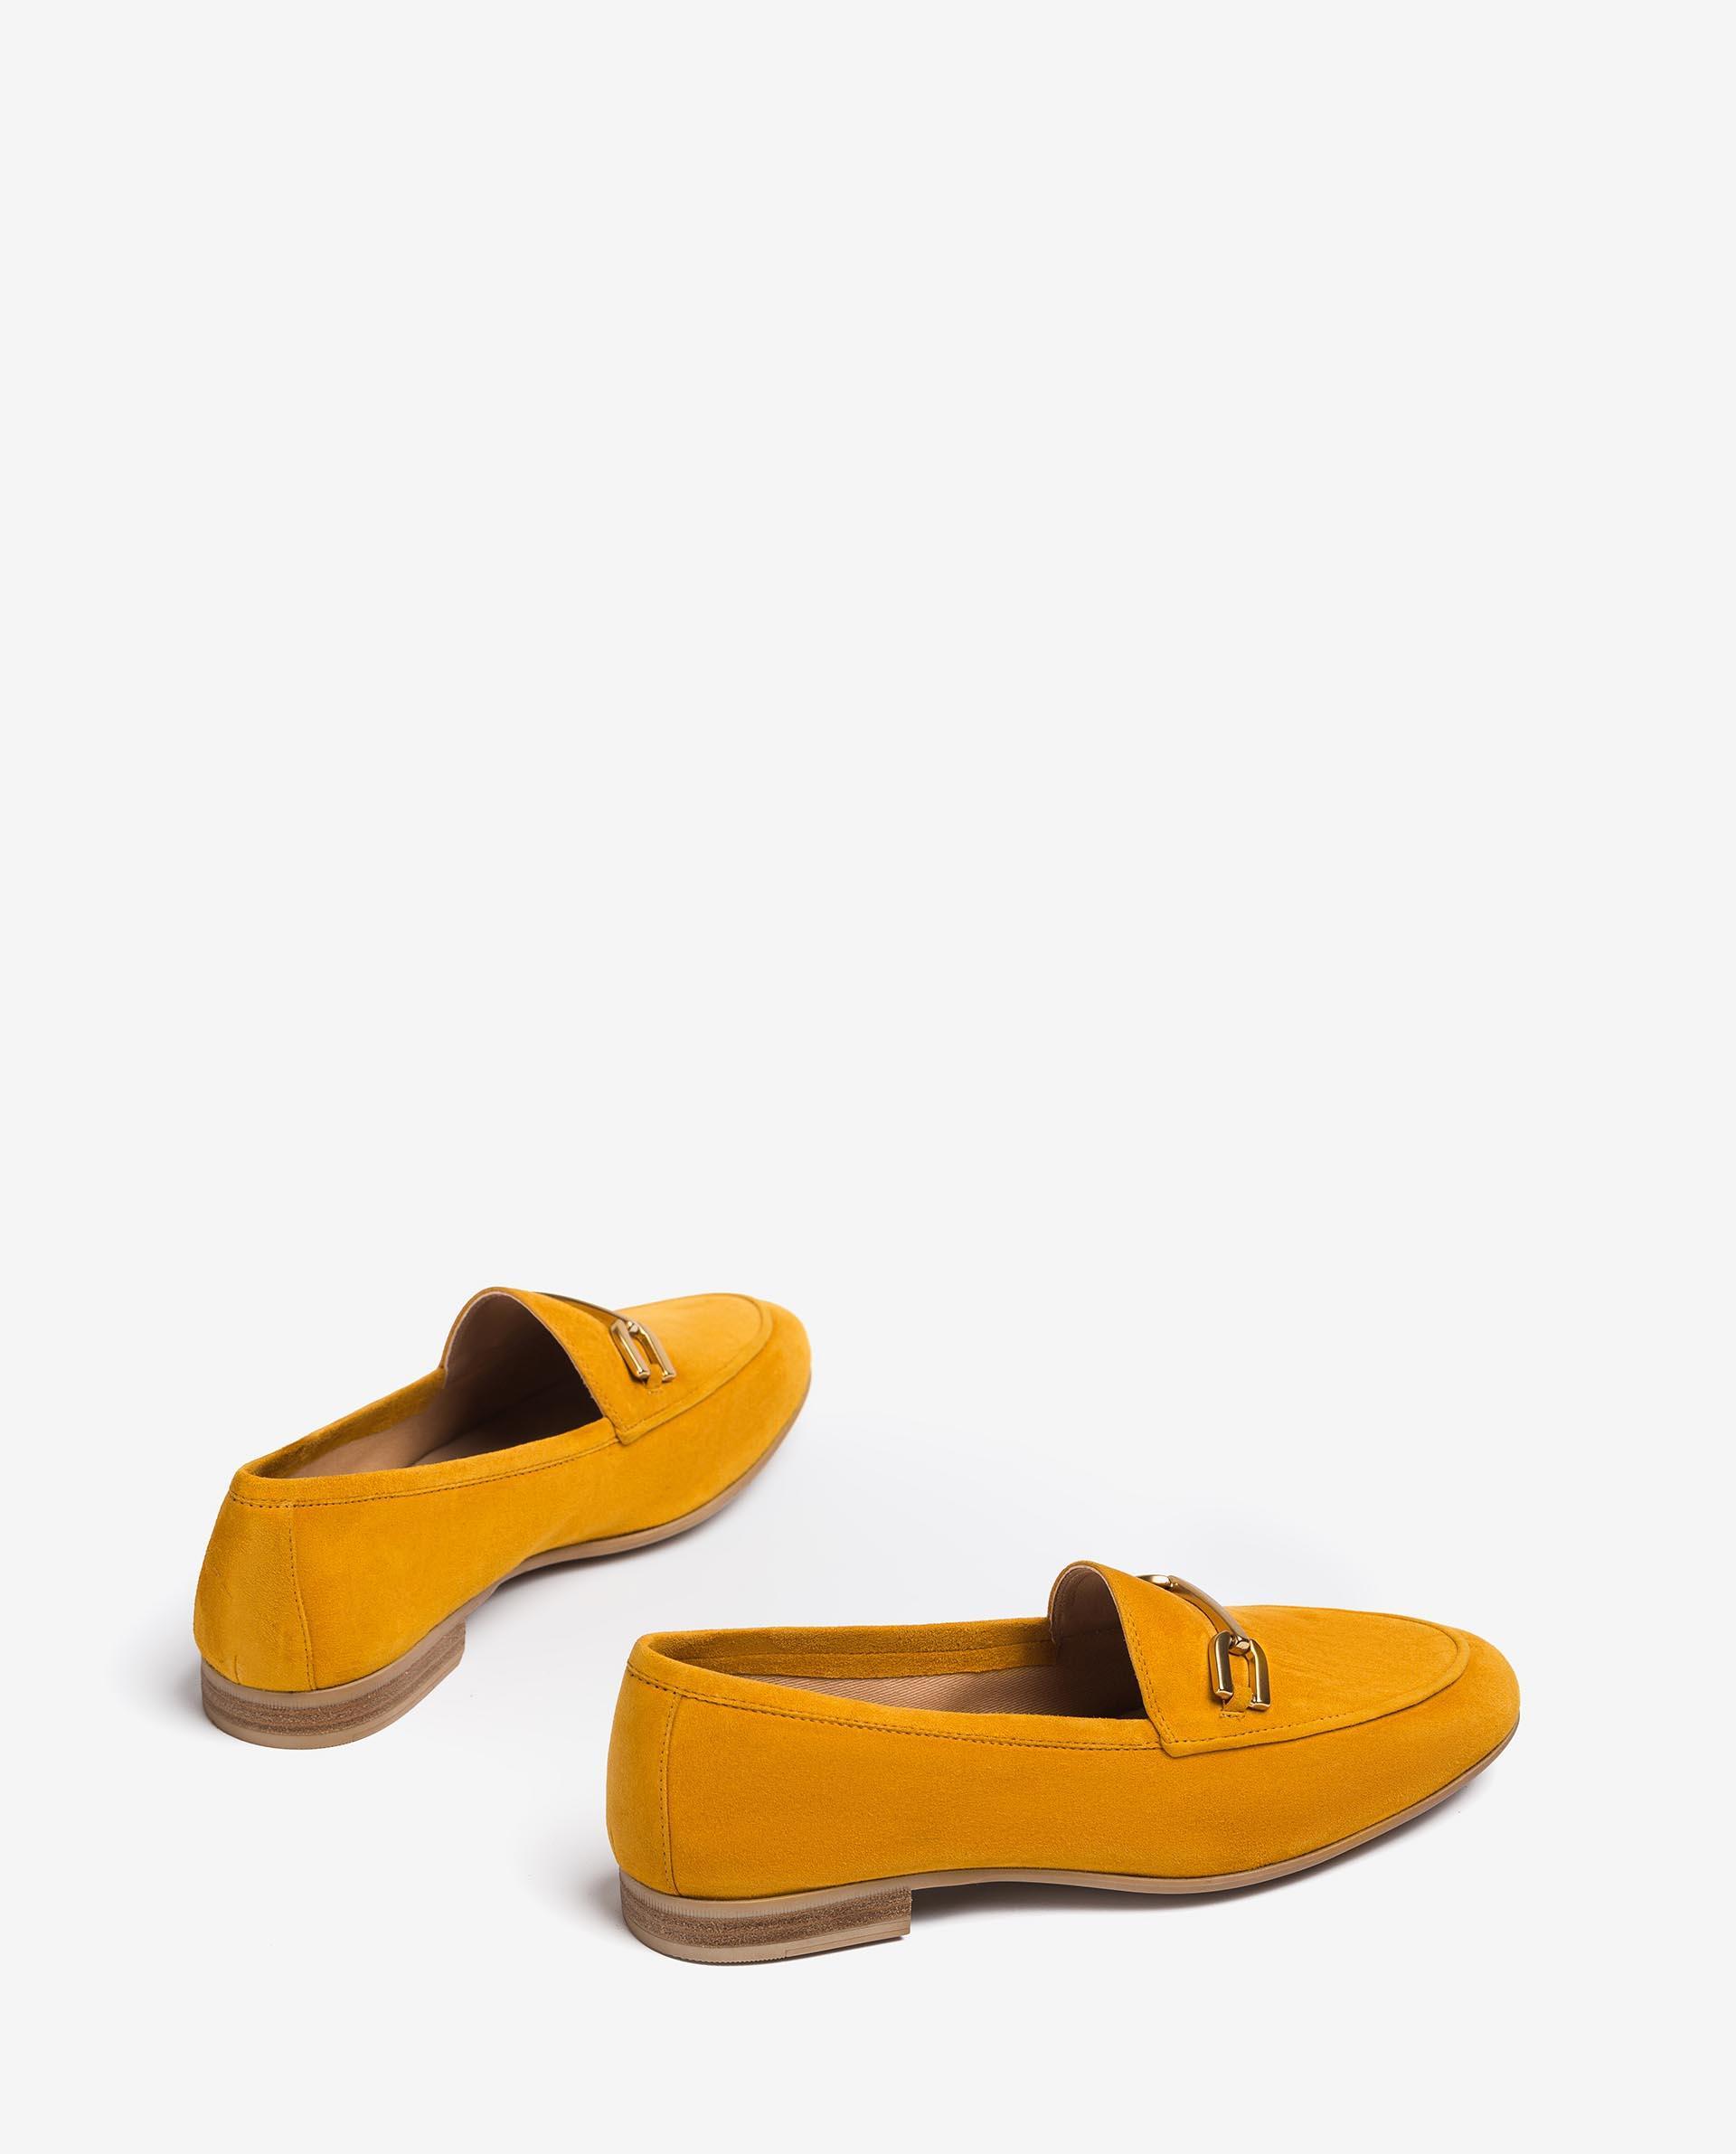 Unisa Loafers DALCY_21_KS mustard